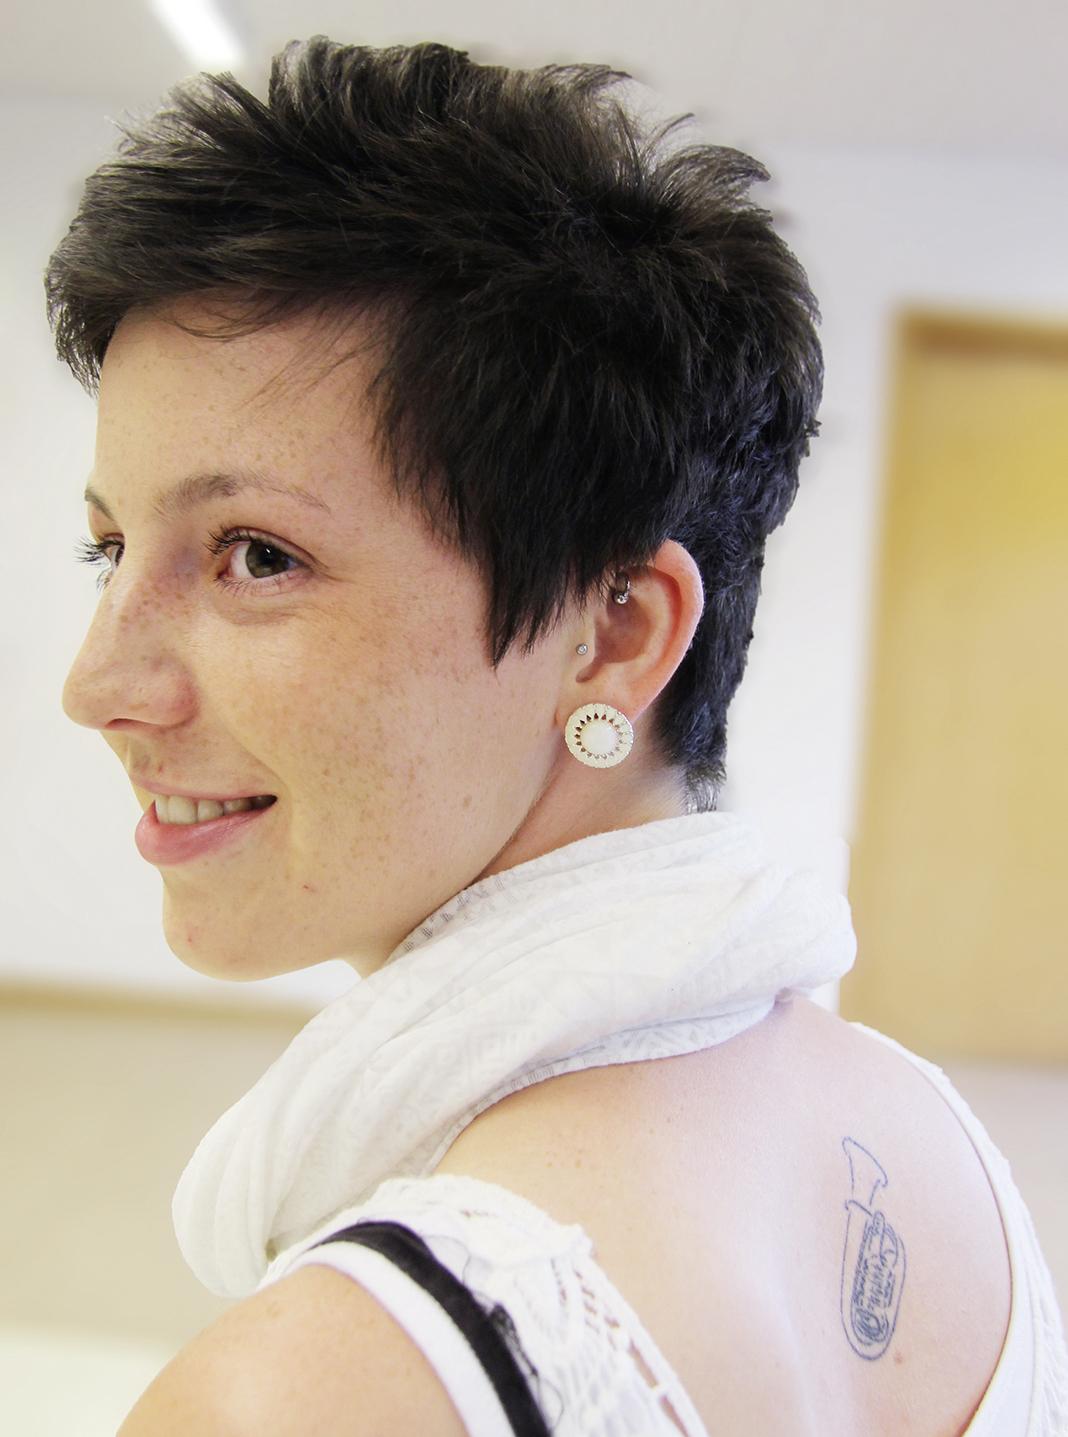 WOLL Sauerland Laura Teschner